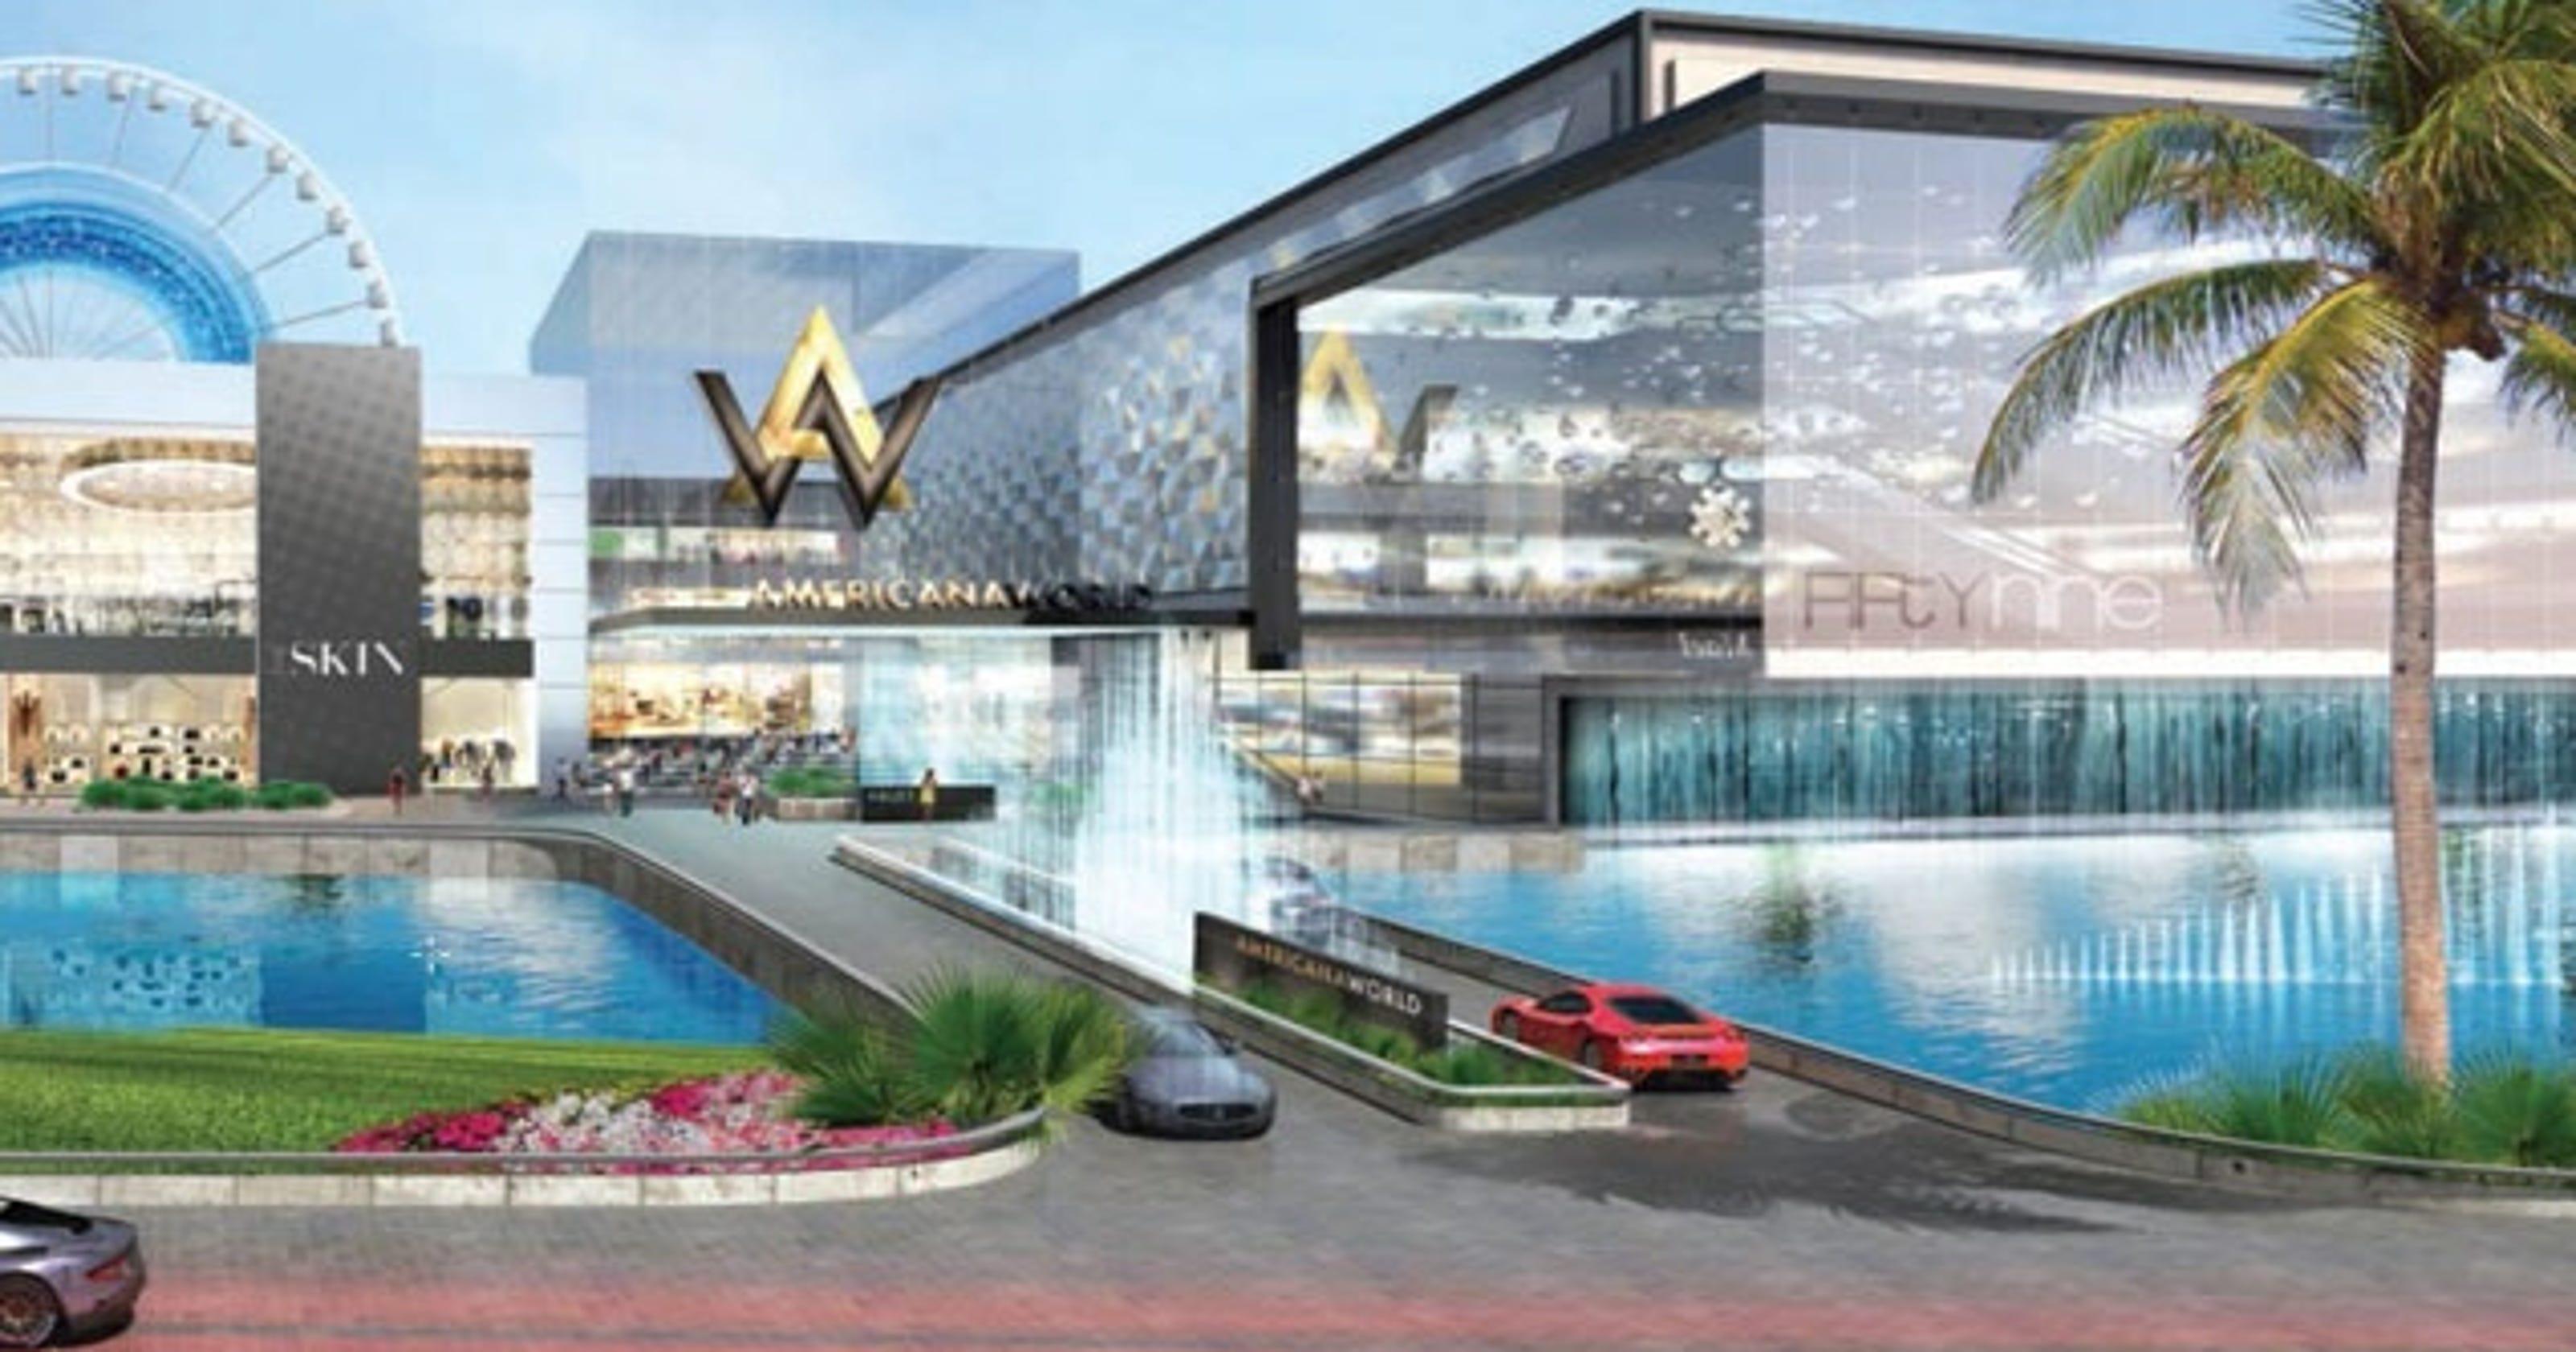 Proposed mega mall near Miami promises jobs, traffic